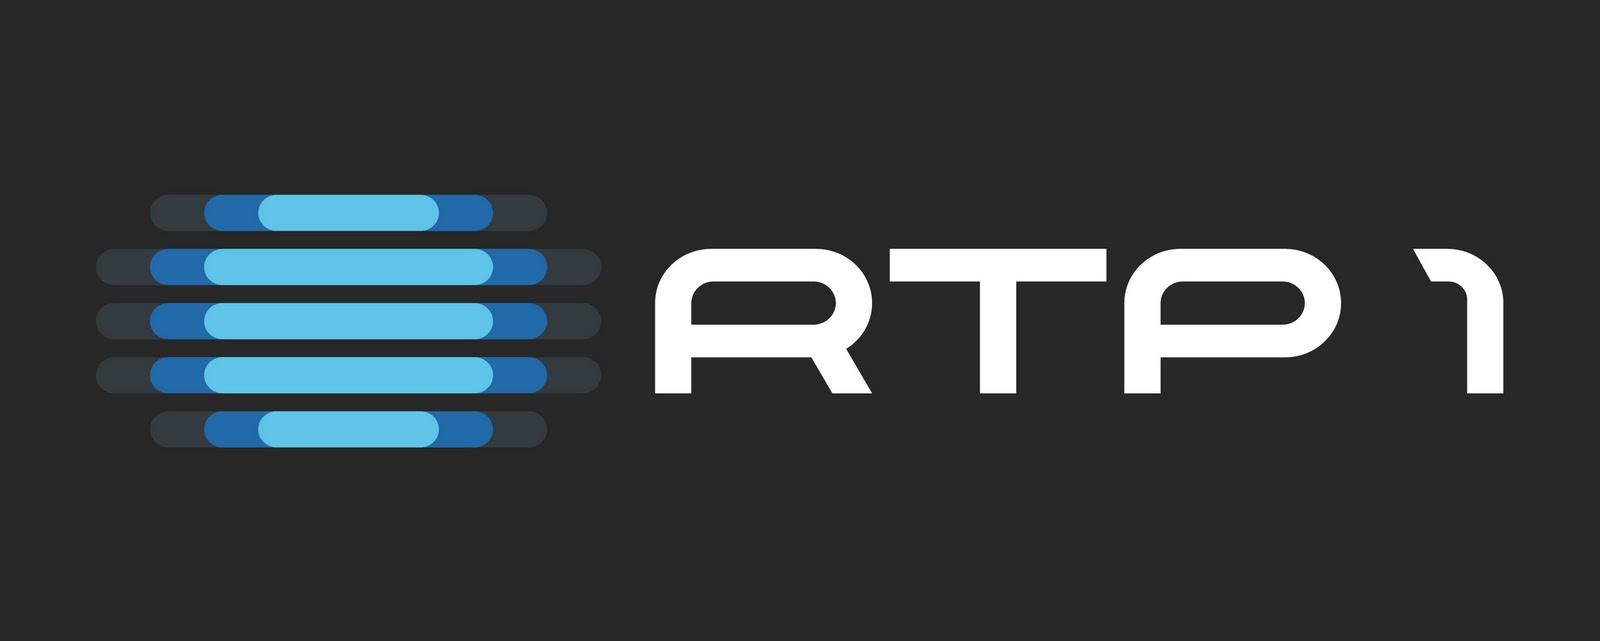 Ver Rtp Online